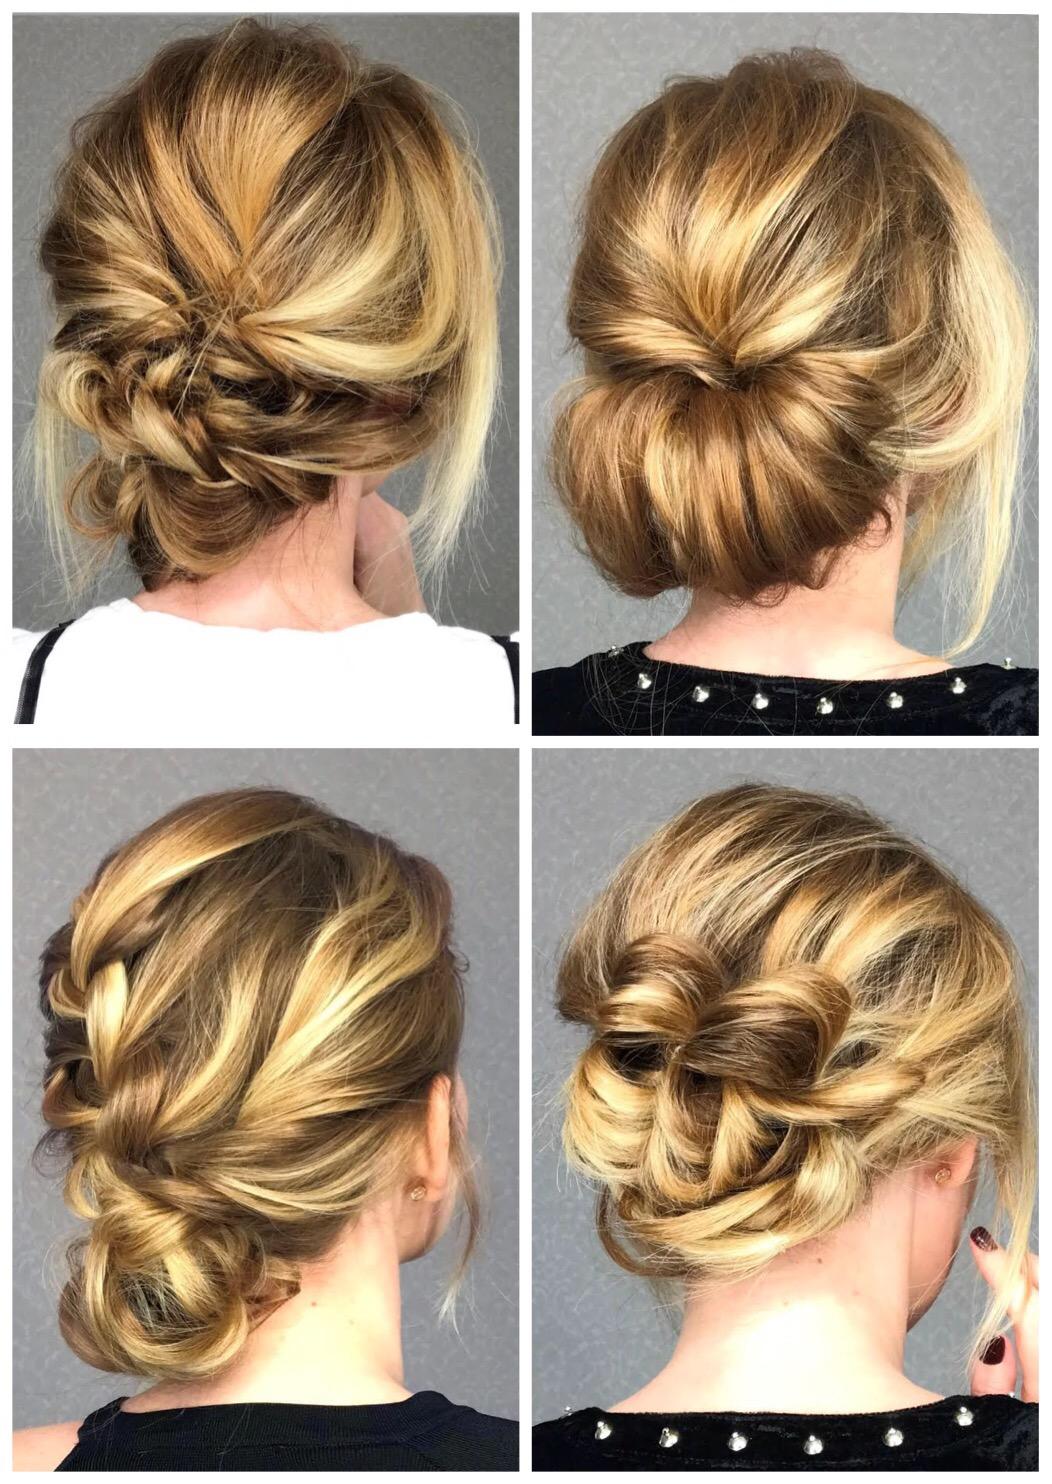 4 Stylish Bun Hairstyles In Easy Video Tutorials